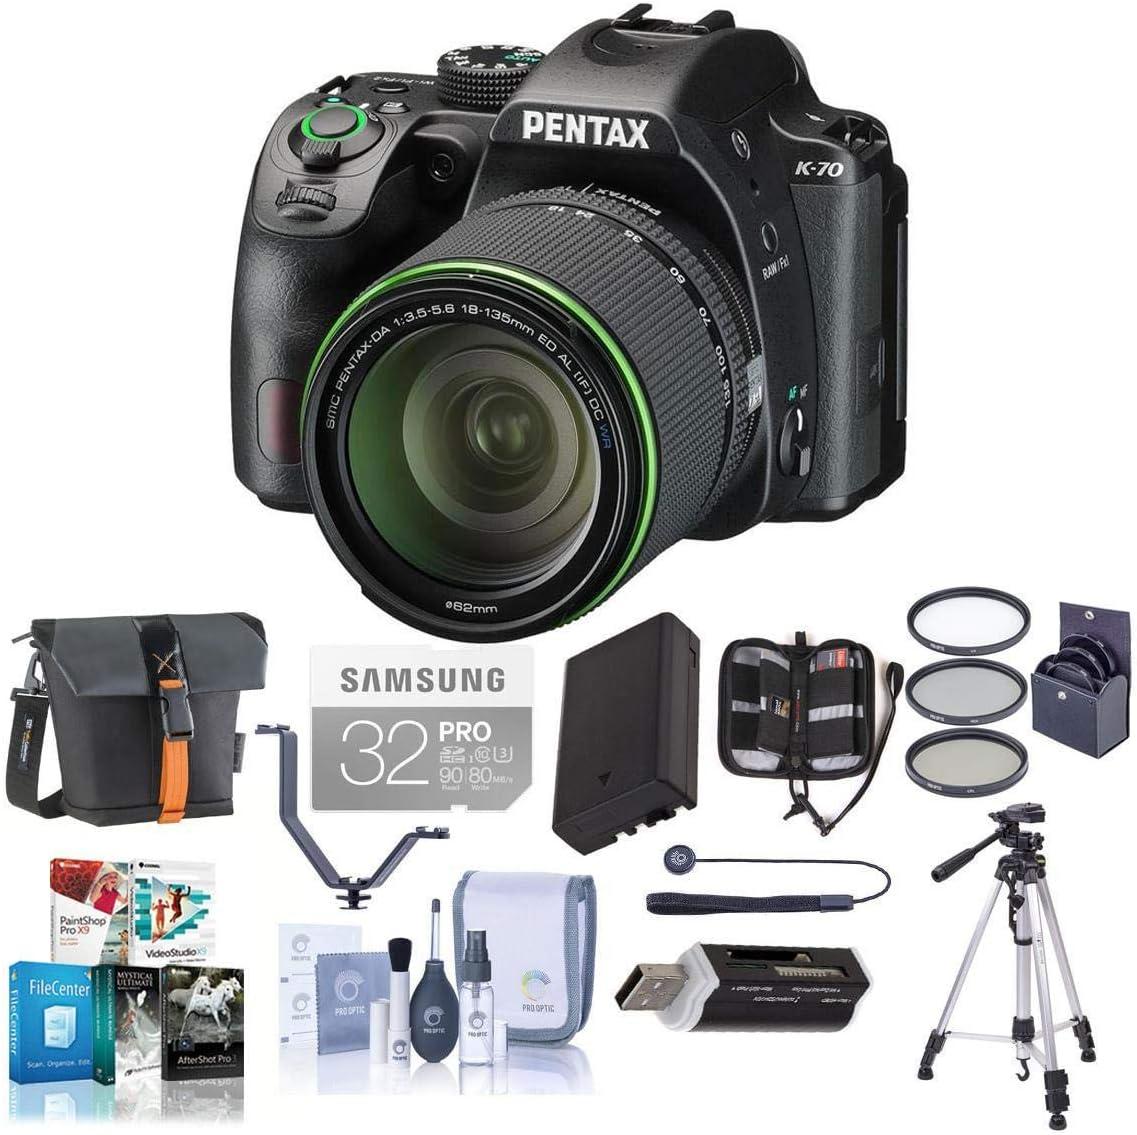 Pentax K-70 Japan Maker New 24MP Full HD DLR Camera DA SMC 18-135mm with 3.5-5 f Soldering